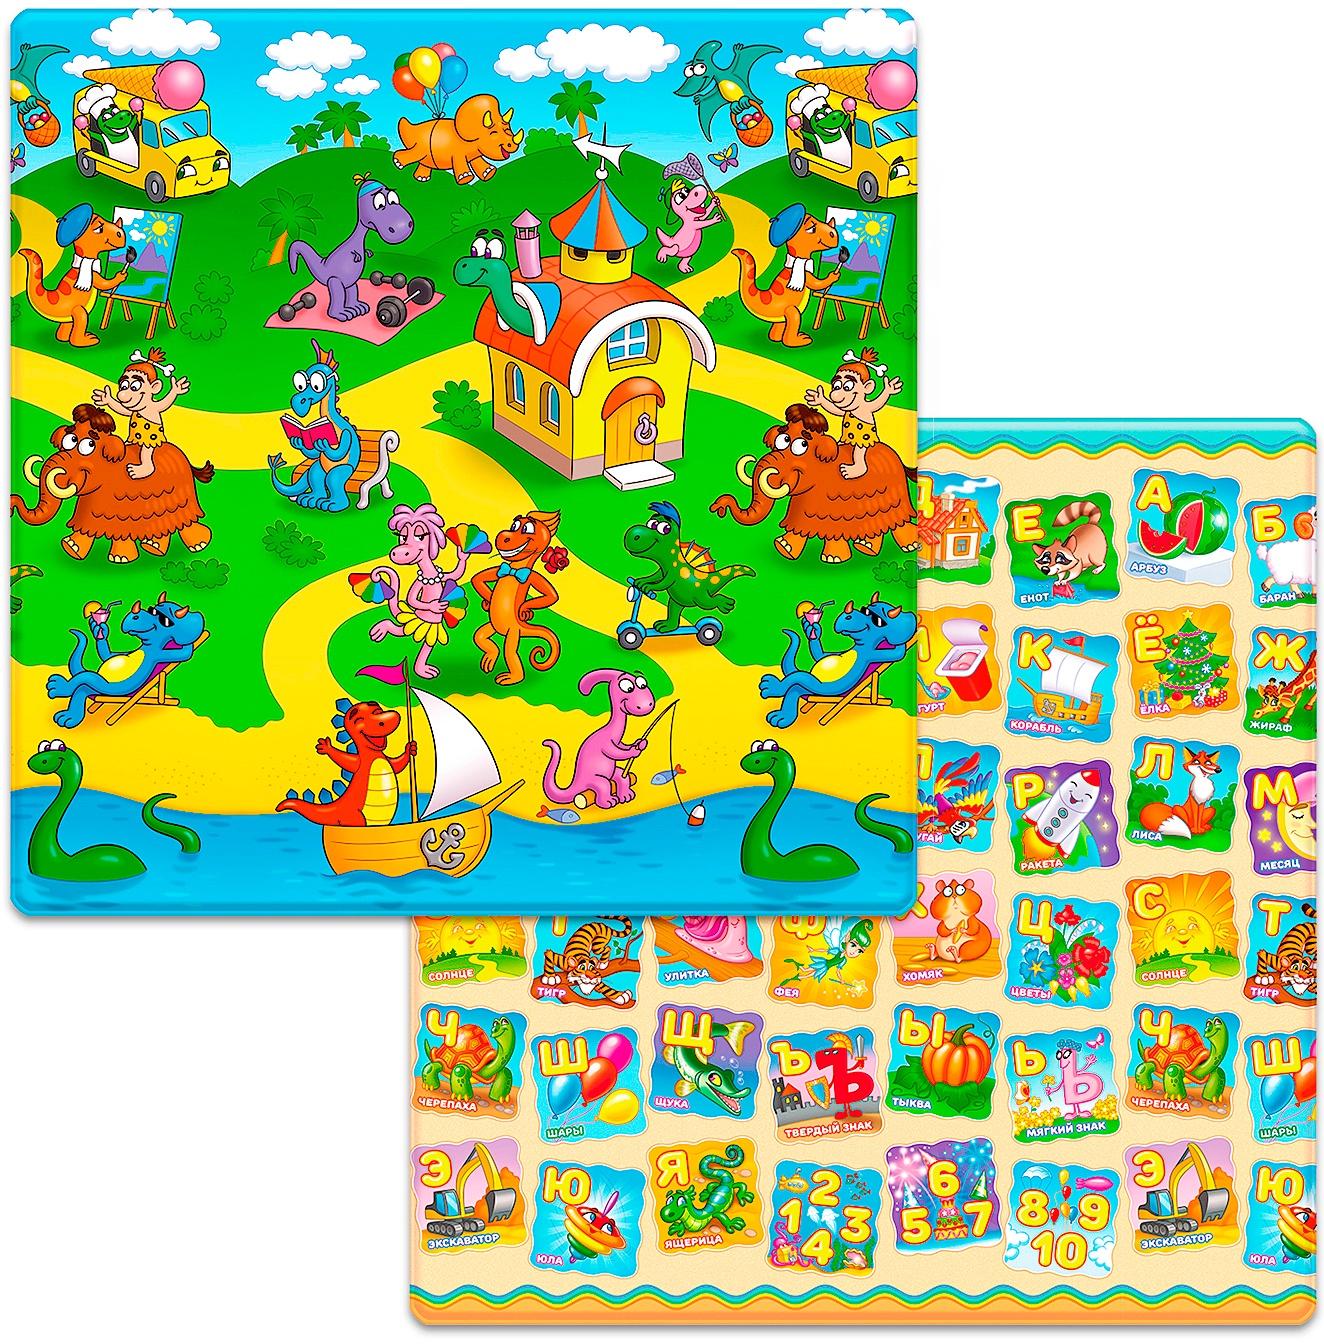 "Funkids / Коврик детский игровой двусторонний ""Small-15"" FD-S15-2S-002"